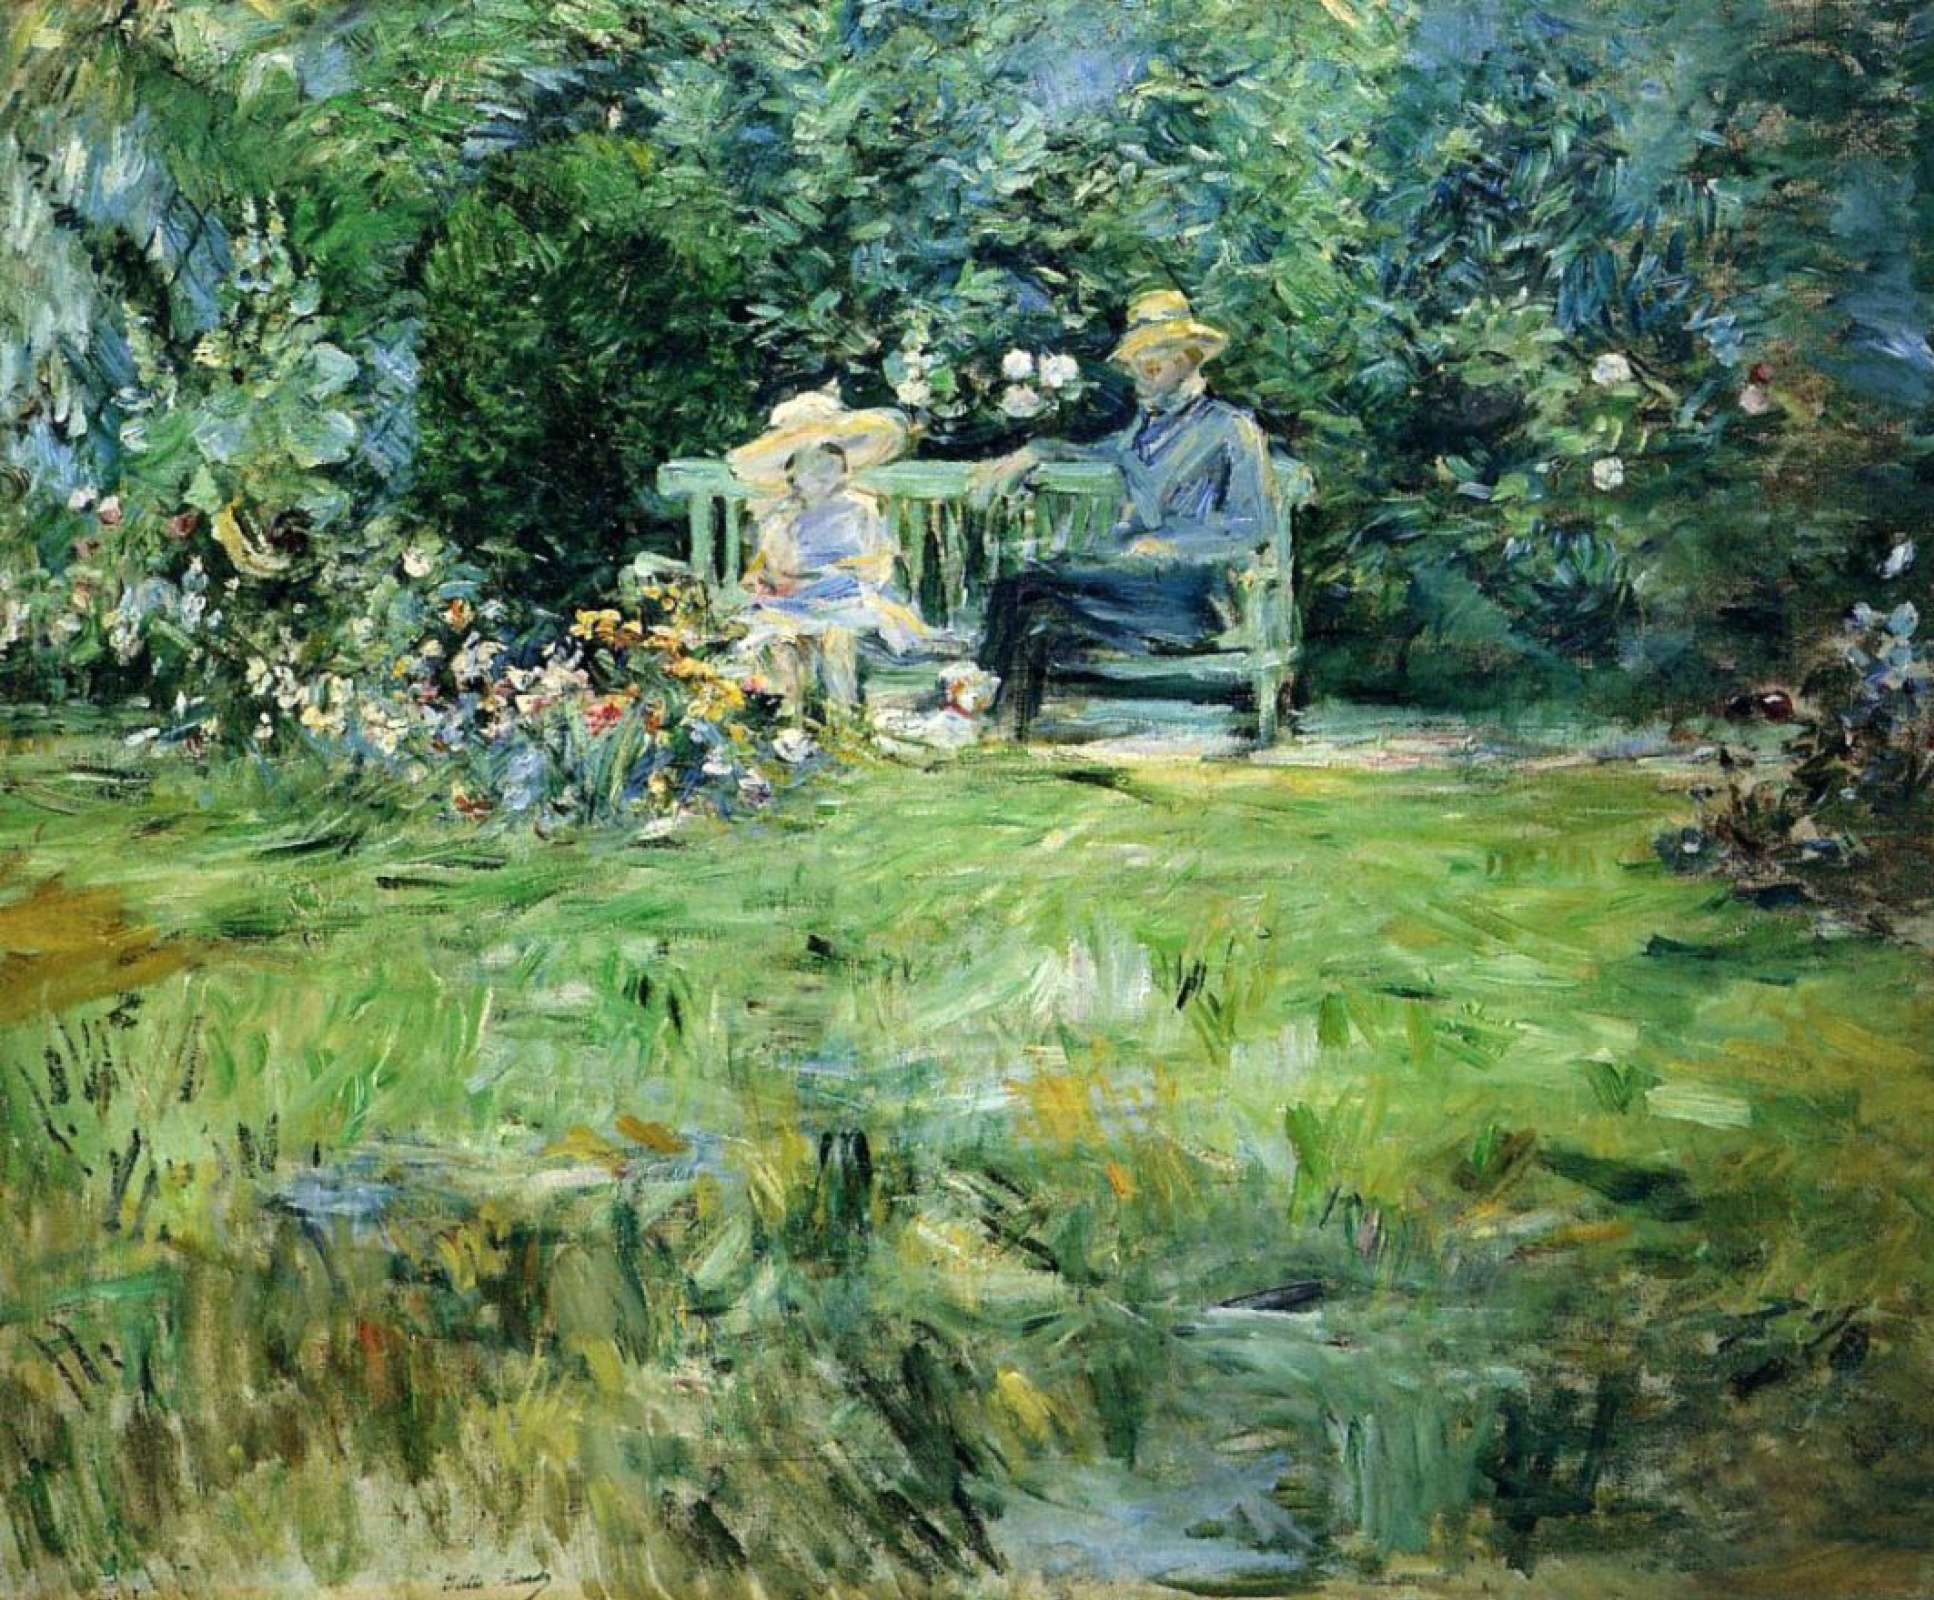 Berthe Morisot. The lesson in the garden